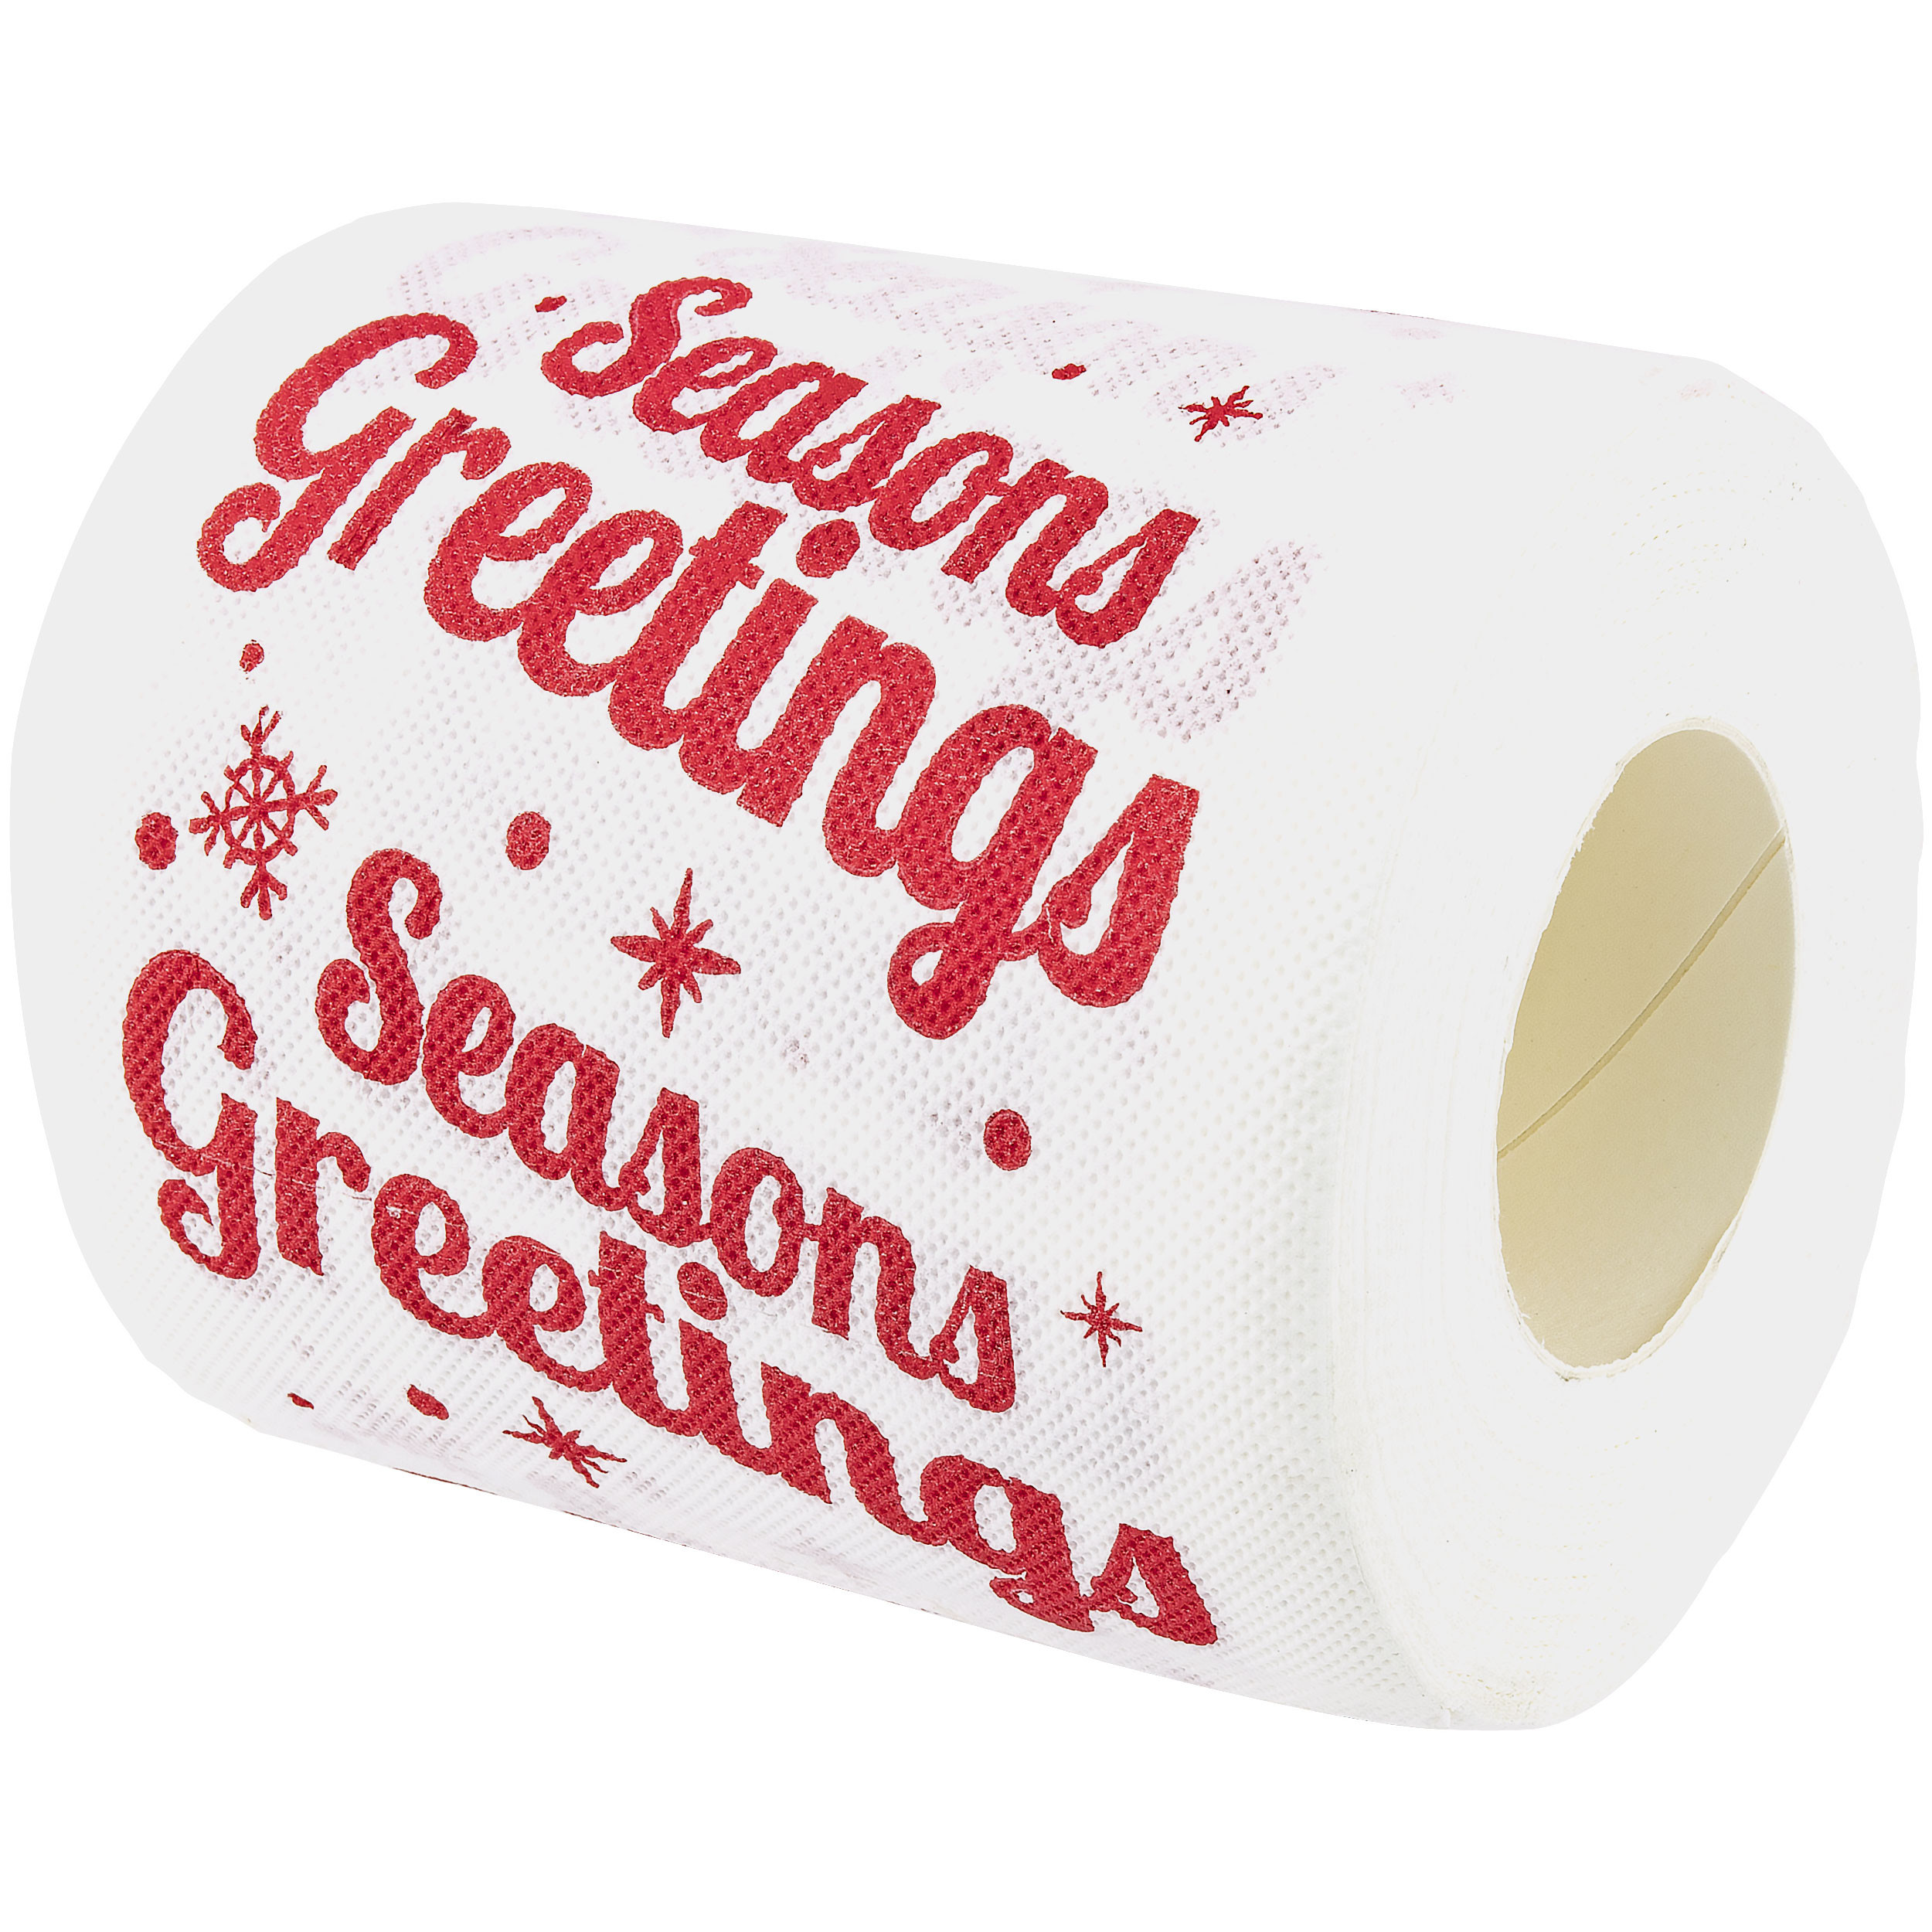 Season Greetings Holiday Novelty Toilet Paper